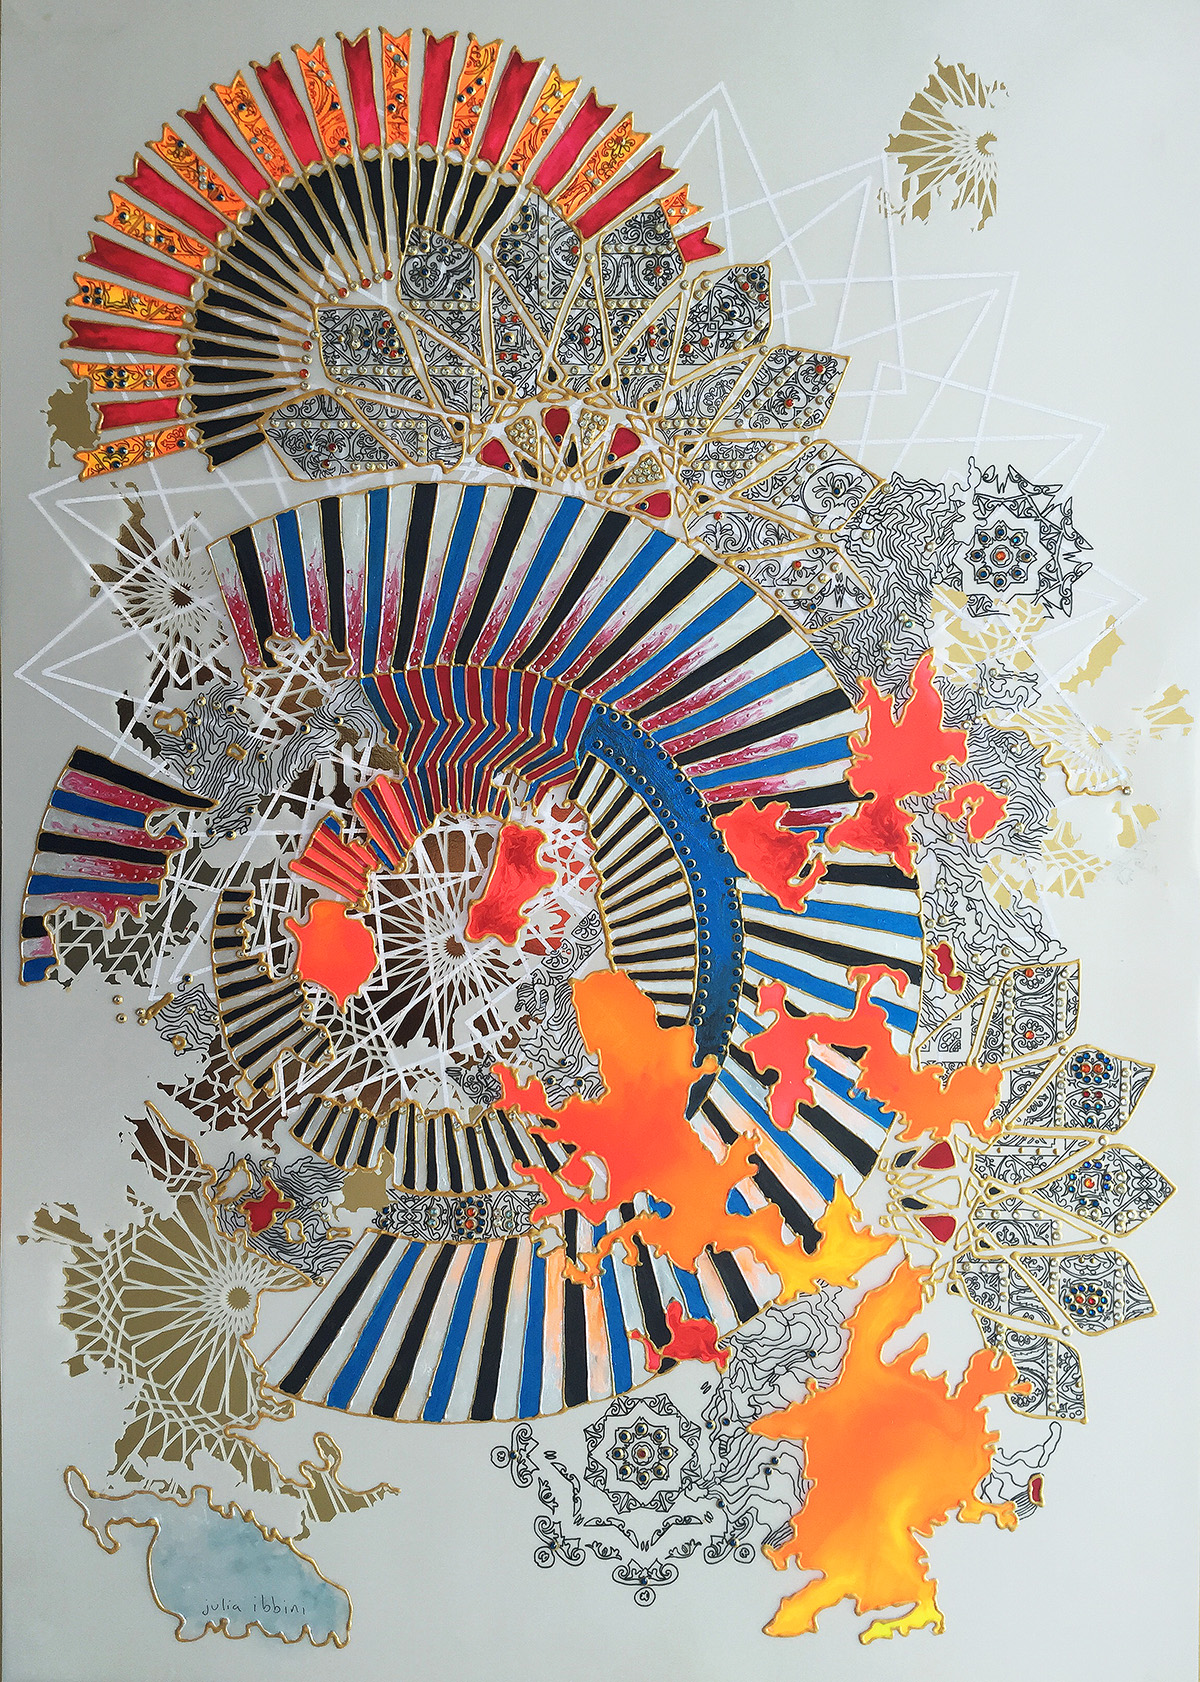 Untitled Study (Khanebani) No. 2